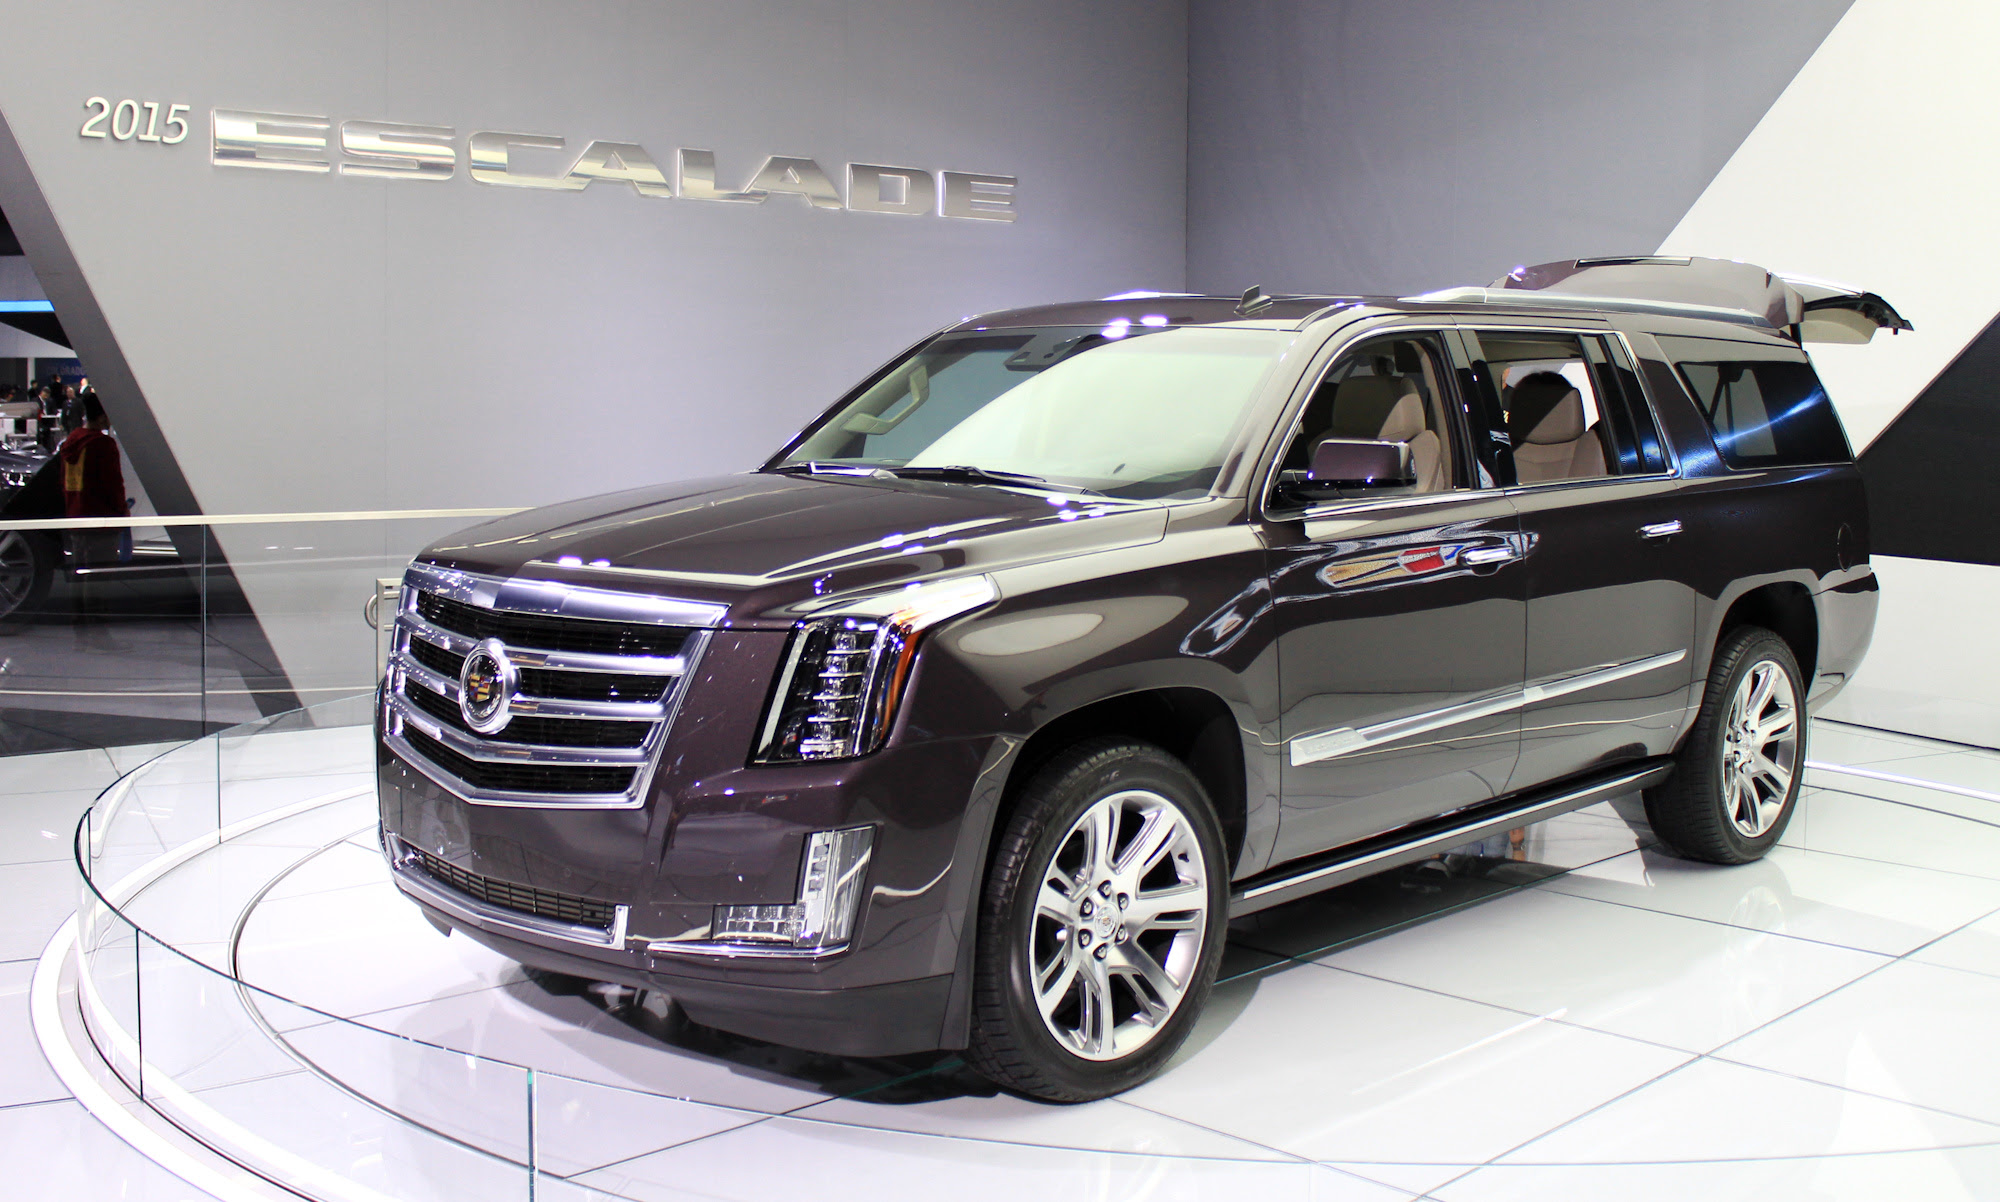 2014 VW Beetle, 2015 Cadillac Escalade, Car Options Rental ...